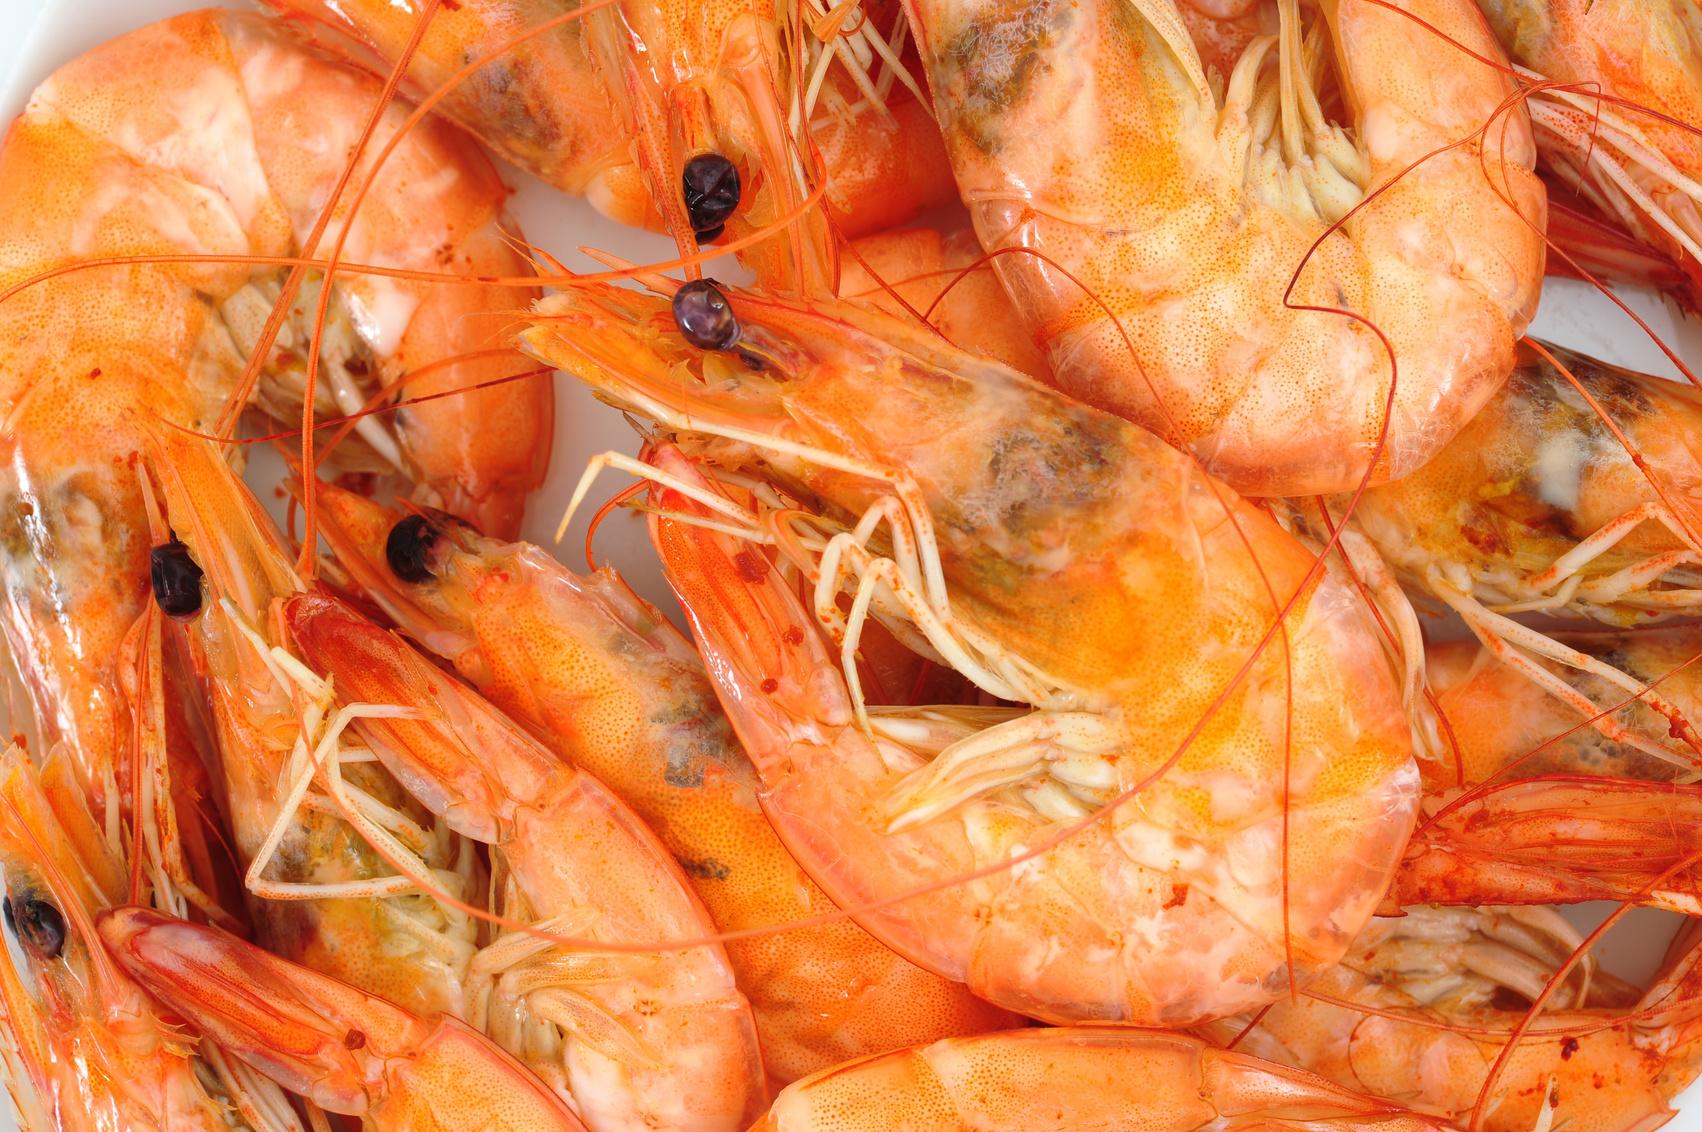 prawns, shrimps